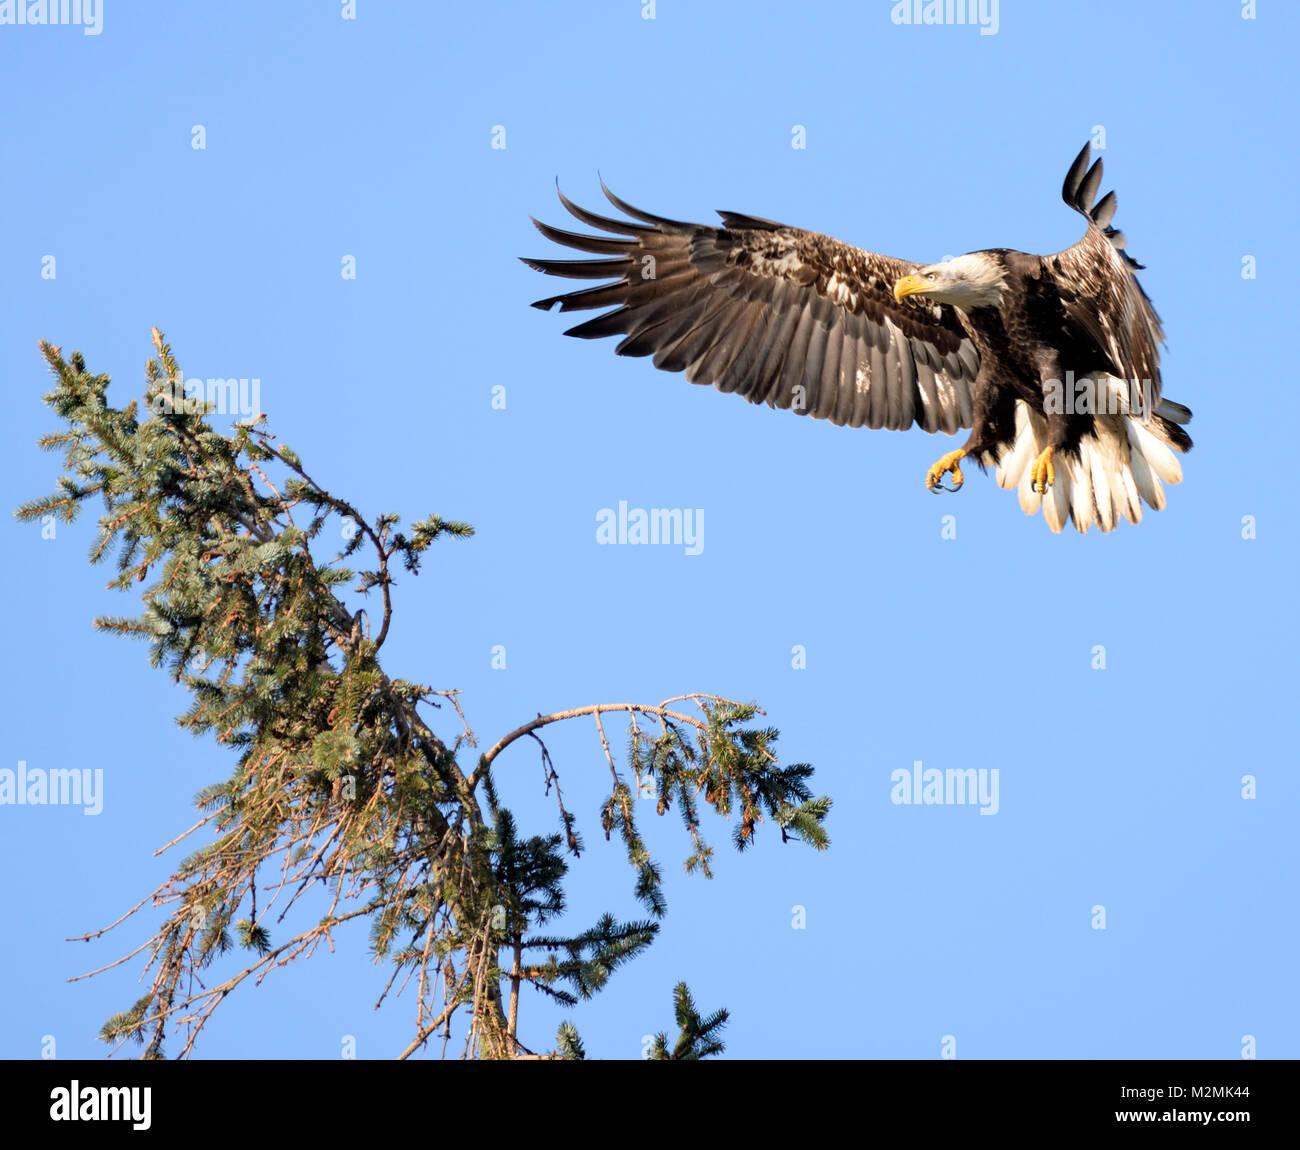 Landing mature bald eagle, Comox, Vancouver Island, British Columbia, Canada. - Stock Image